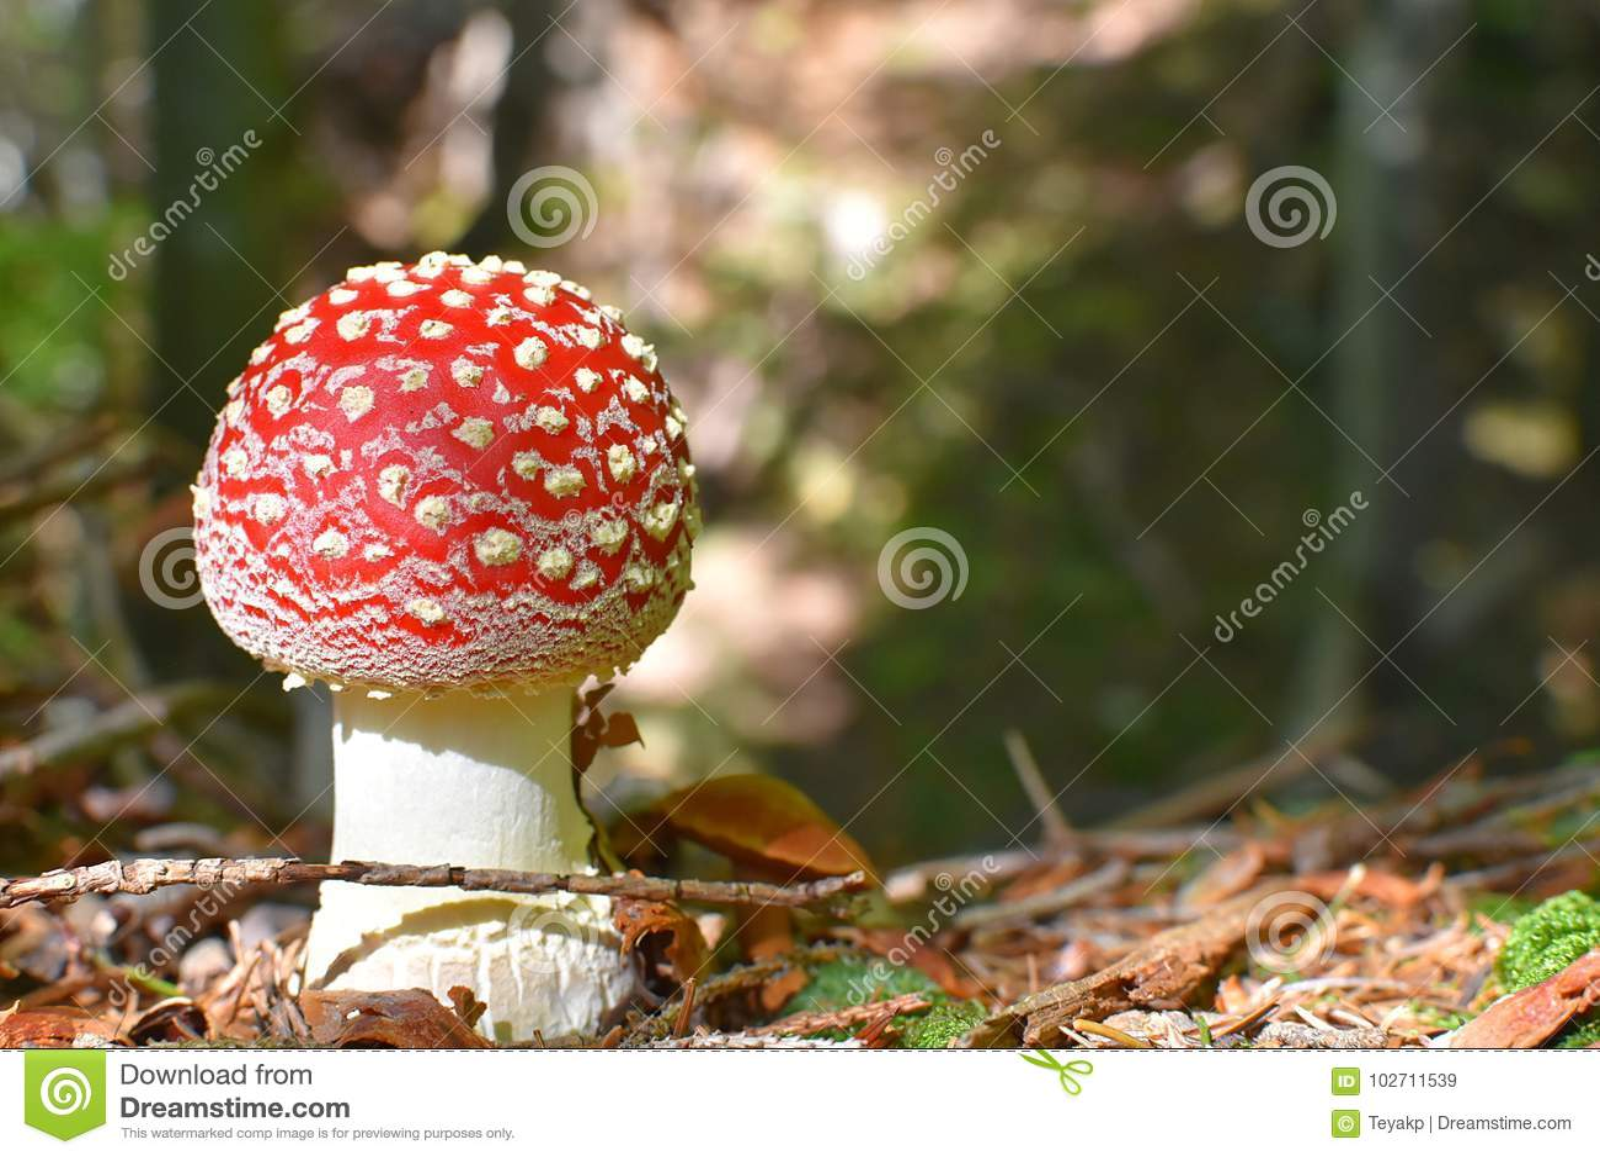 Flyagaric mushroom